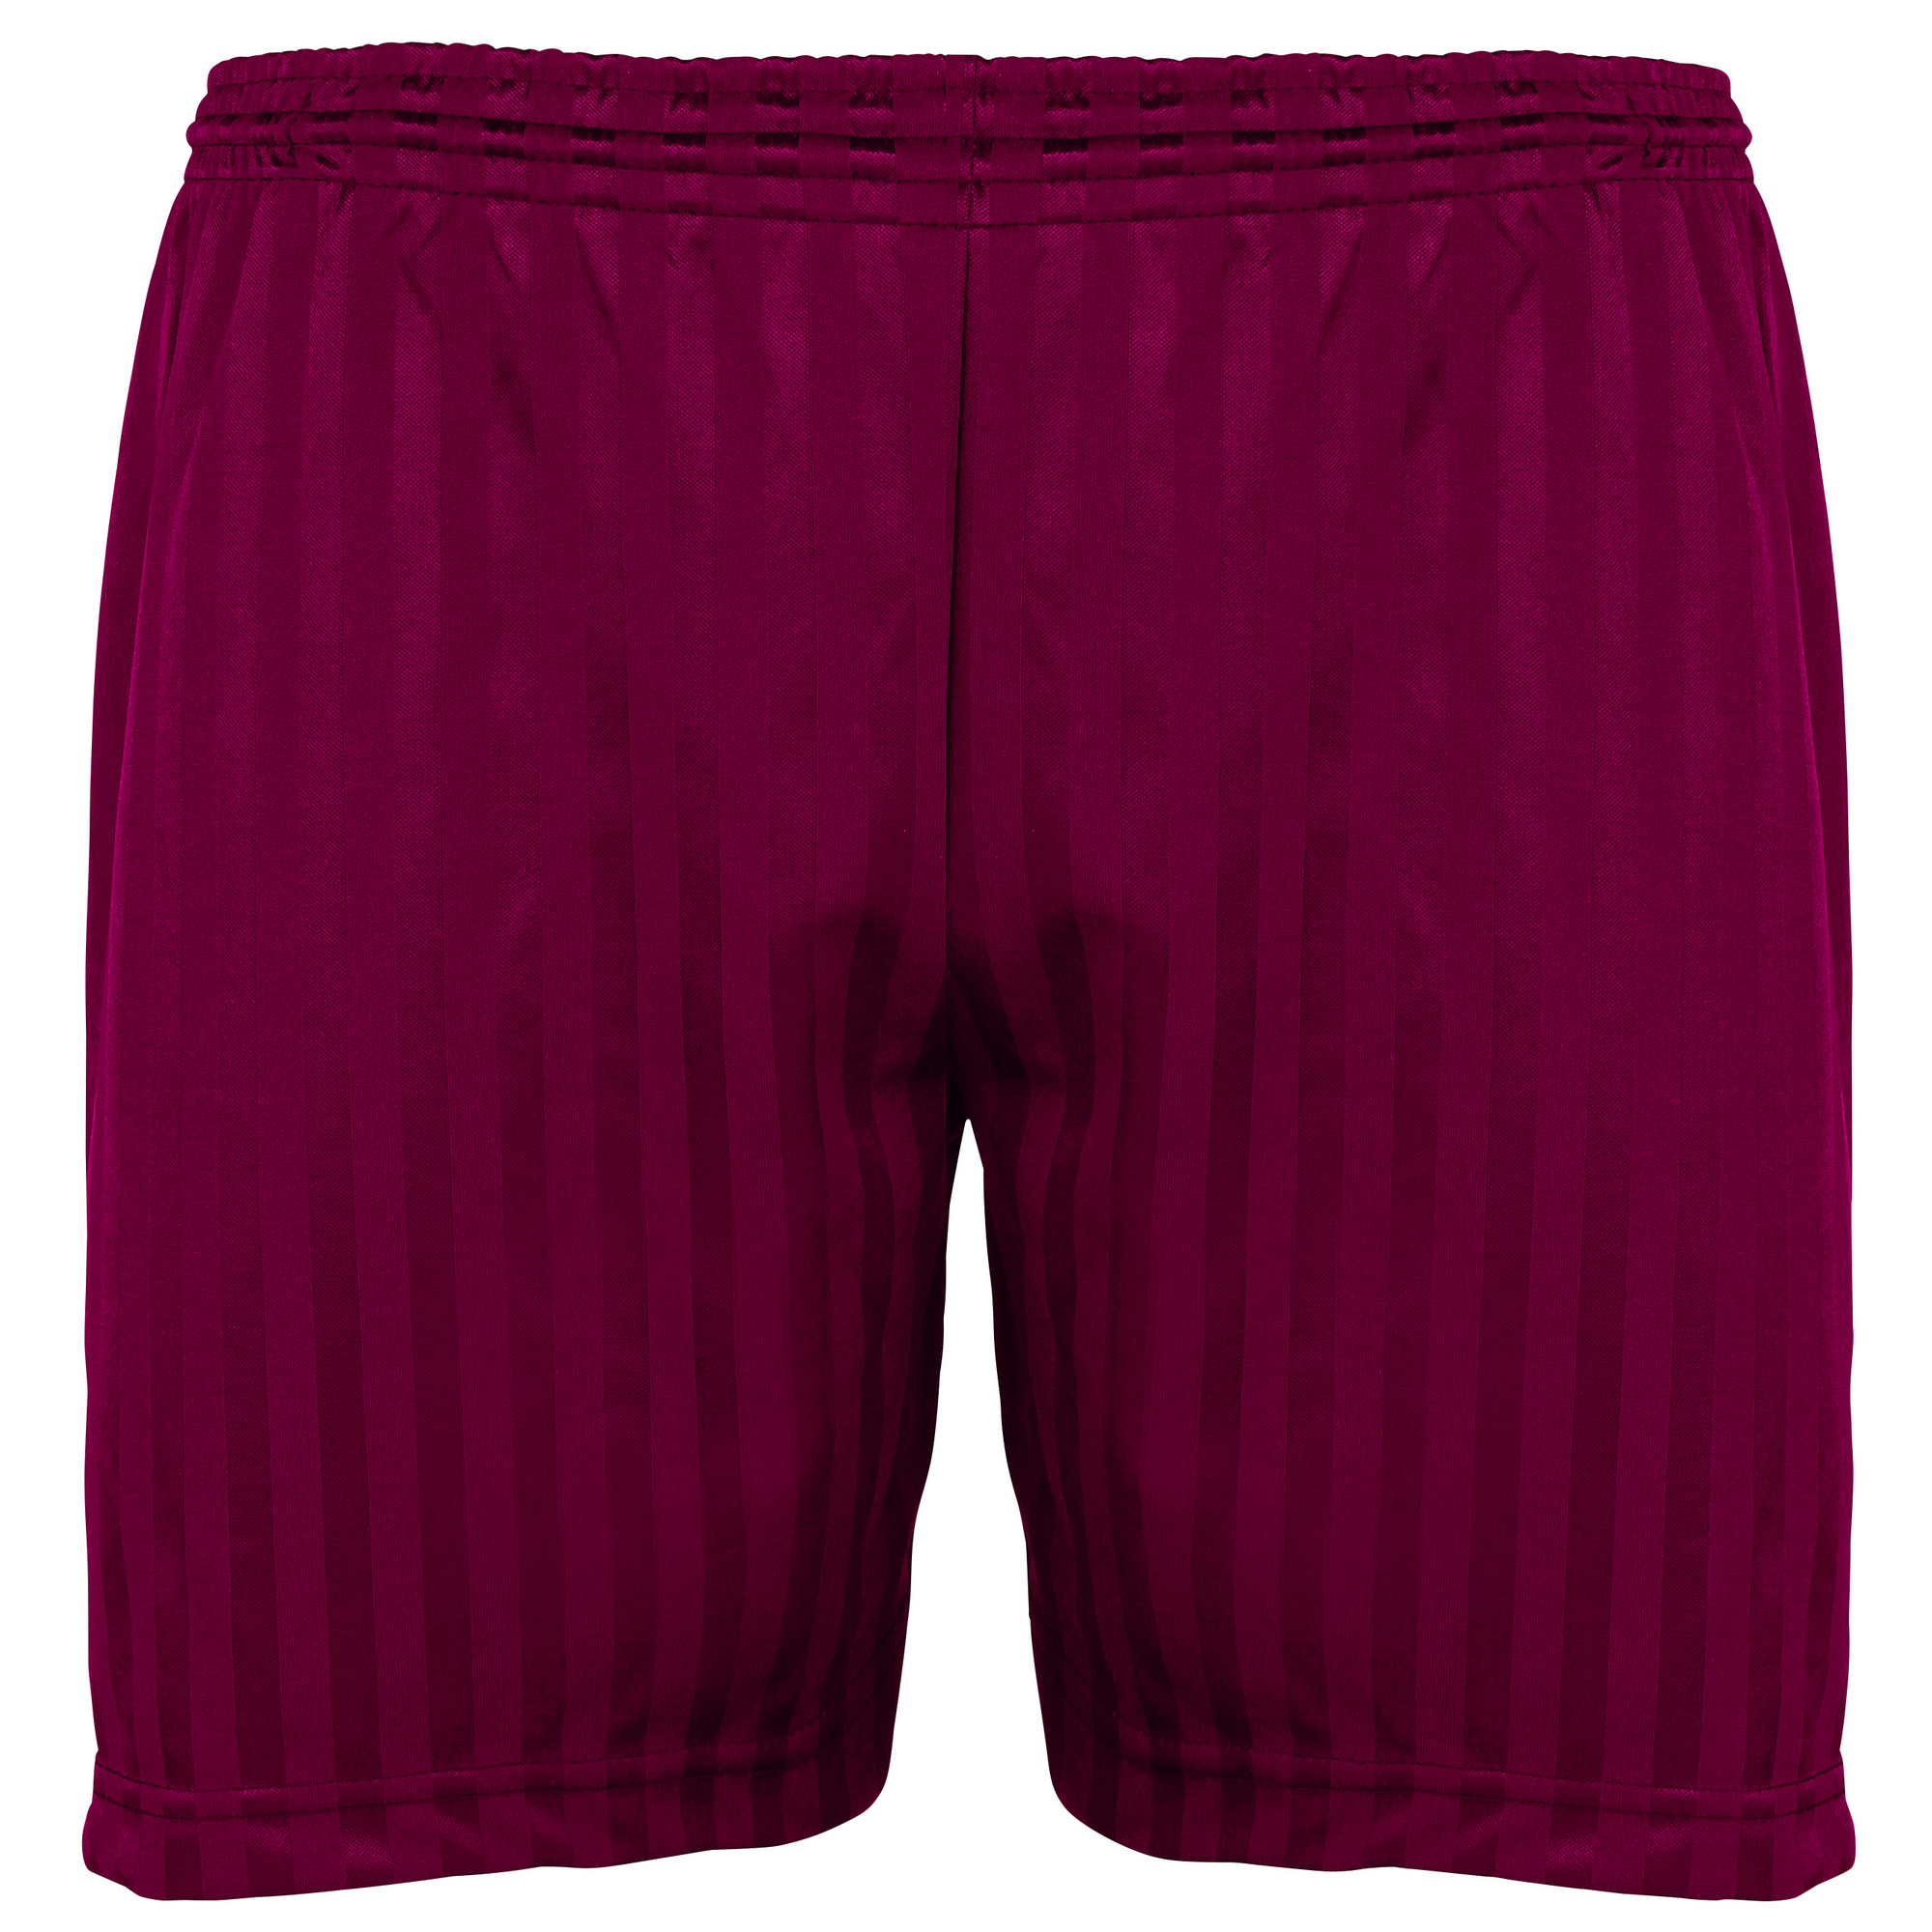 UNISEX MENS WOMENS SHADOW STRIPE FOOTBALL SHORTS BOYS GIRLS ACTIVE SPORTS PANTS